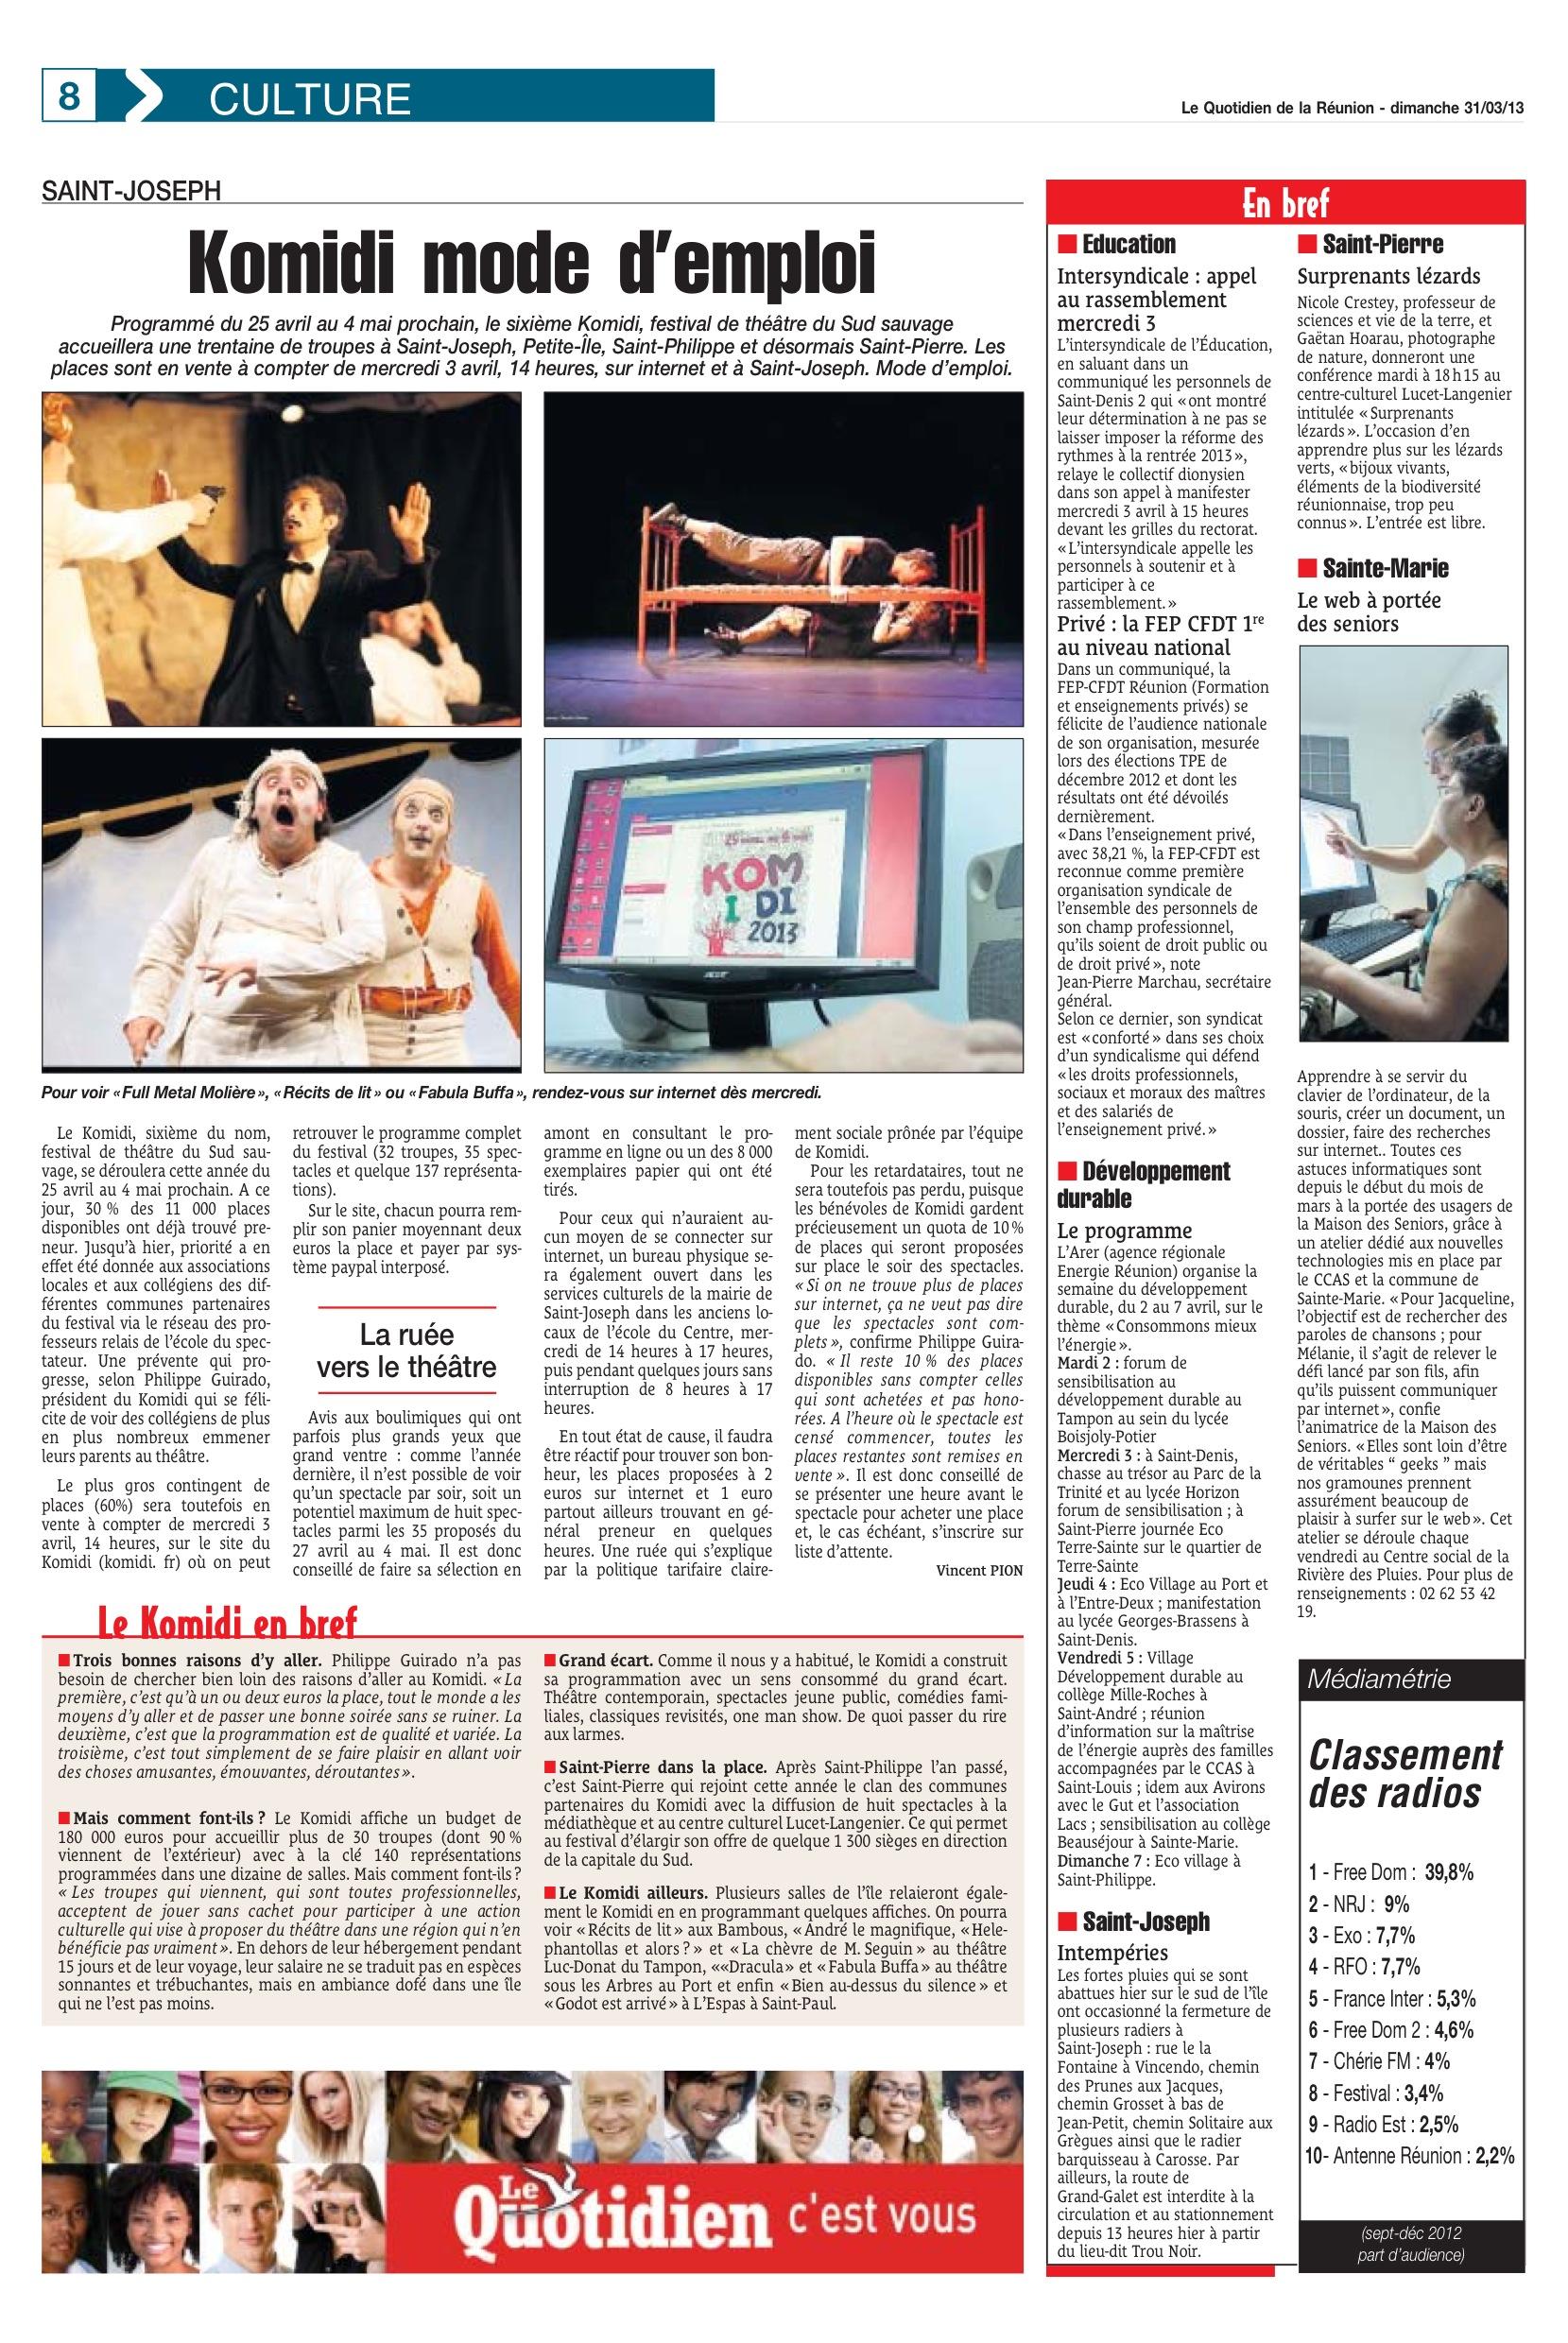 Presse-Quotidien-31032013